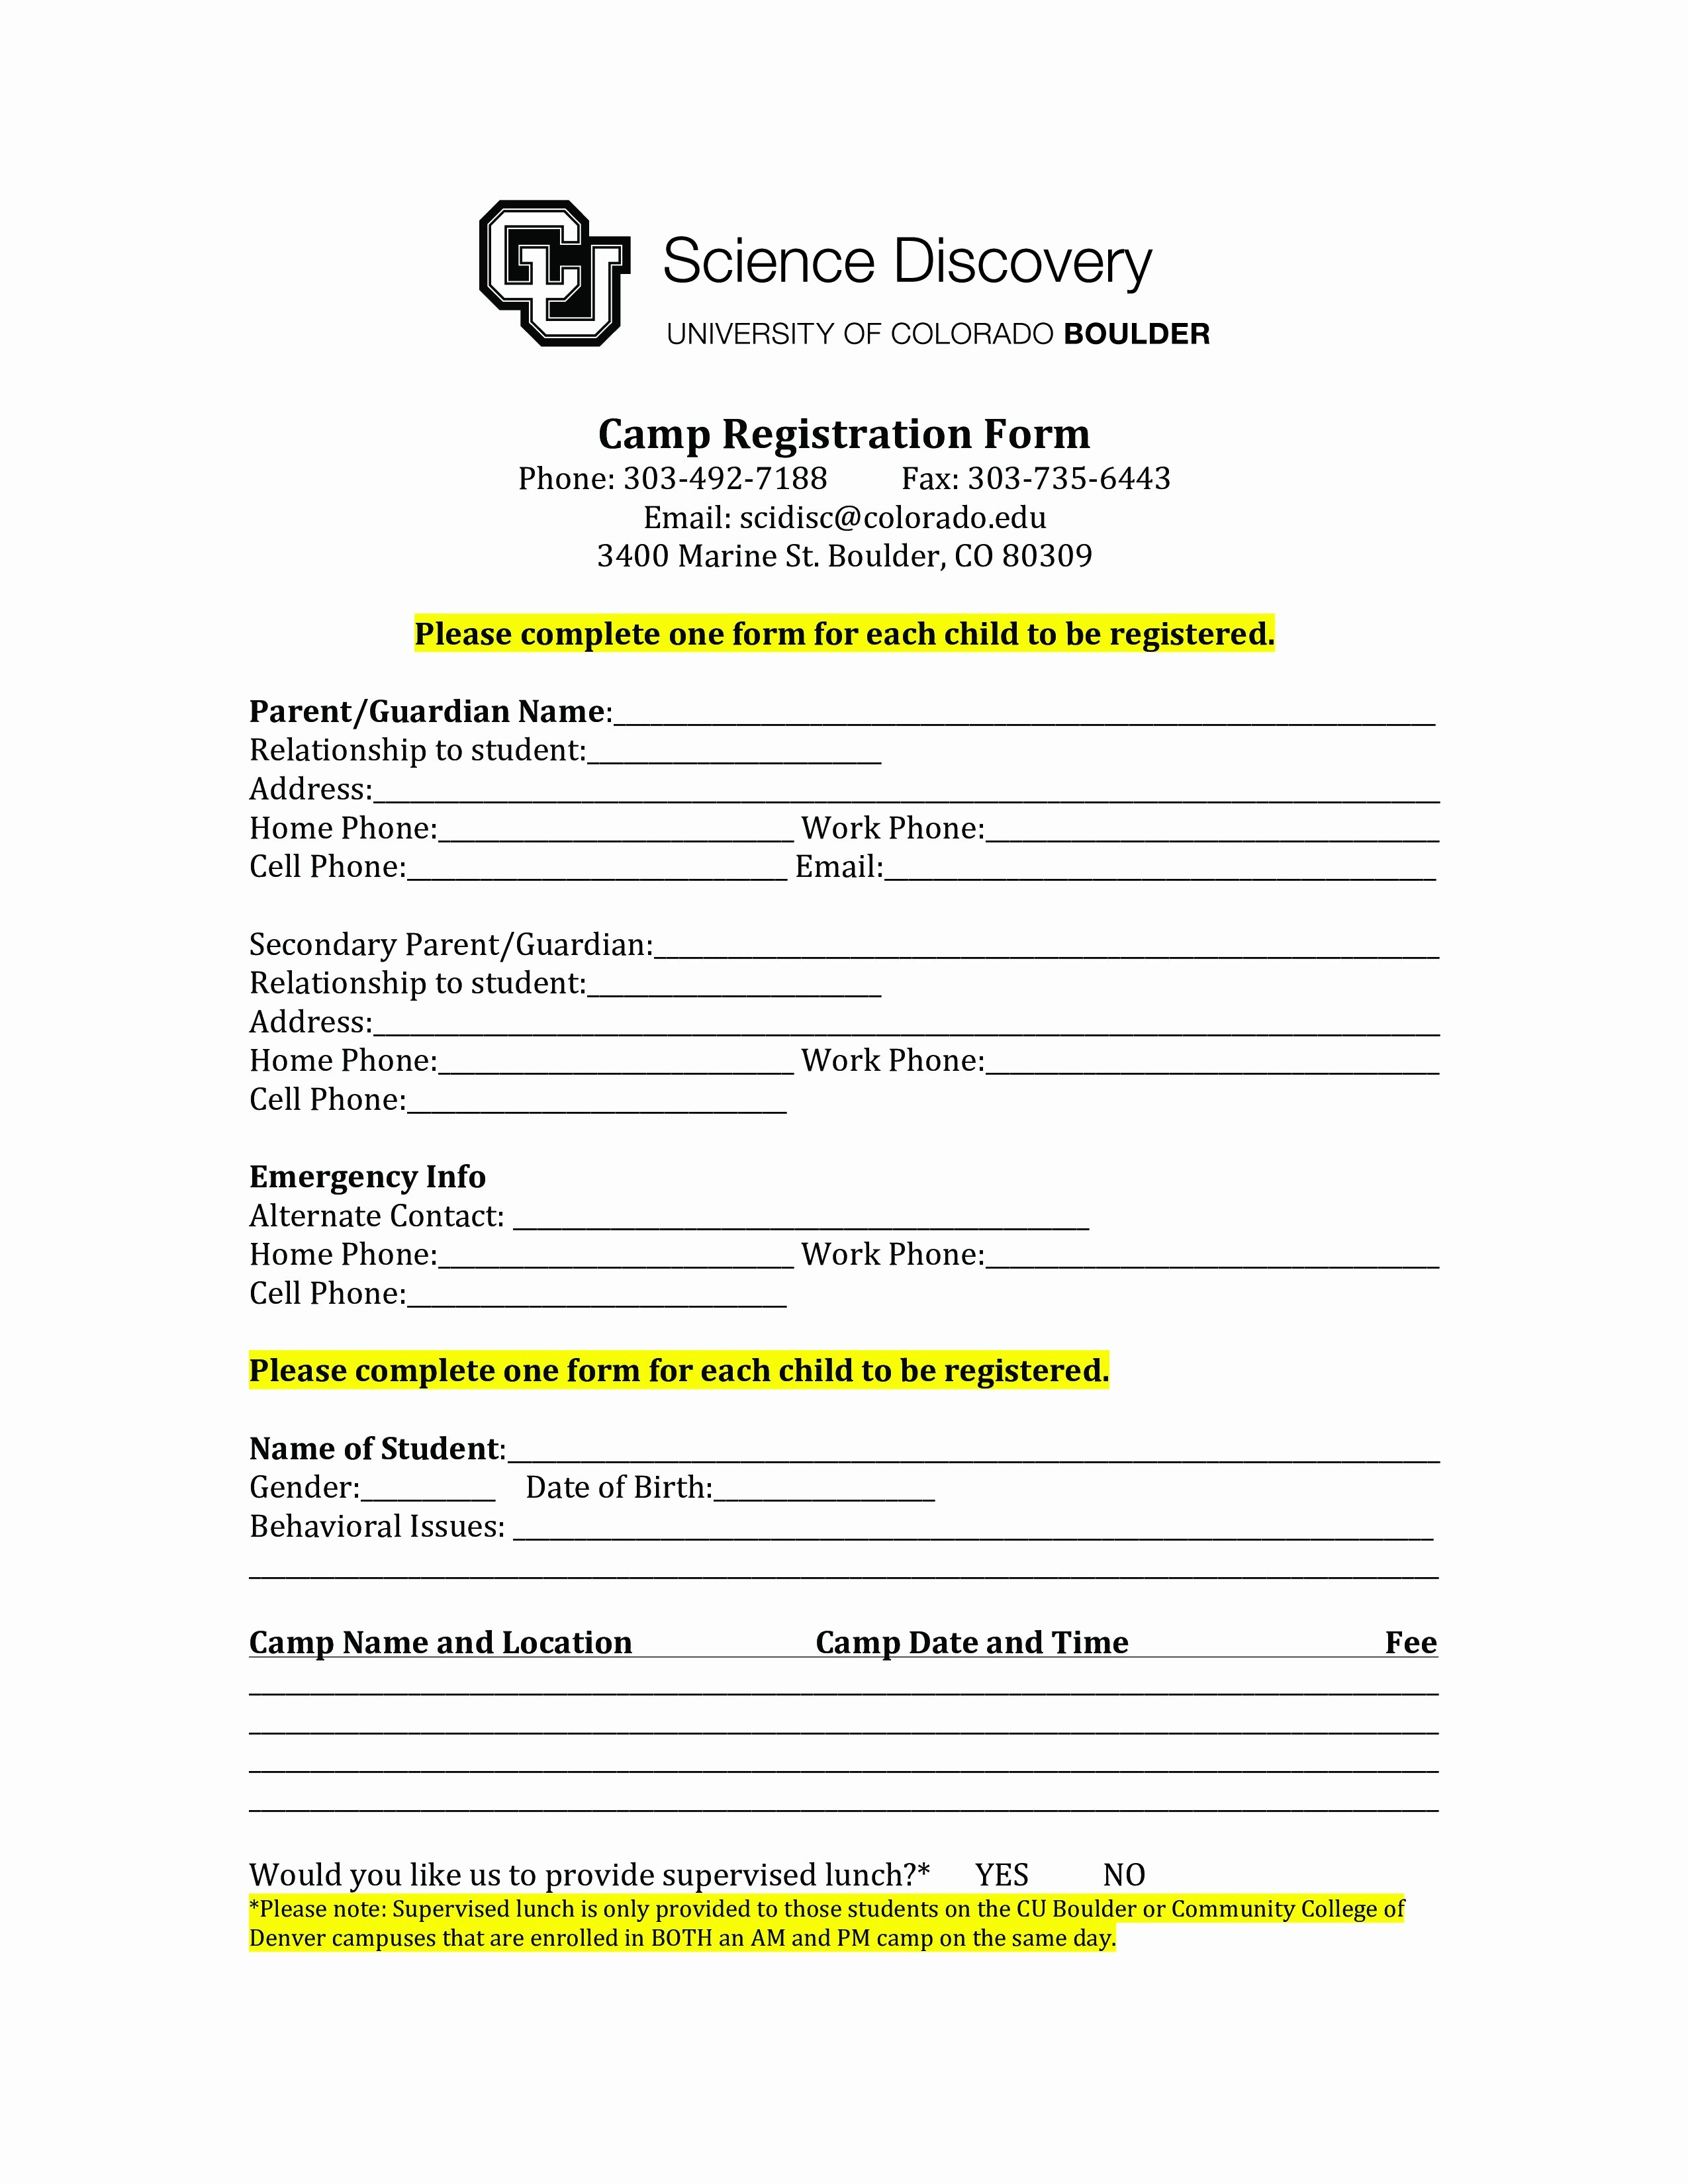 Camp Registration form Template Unique Camp Application form Template